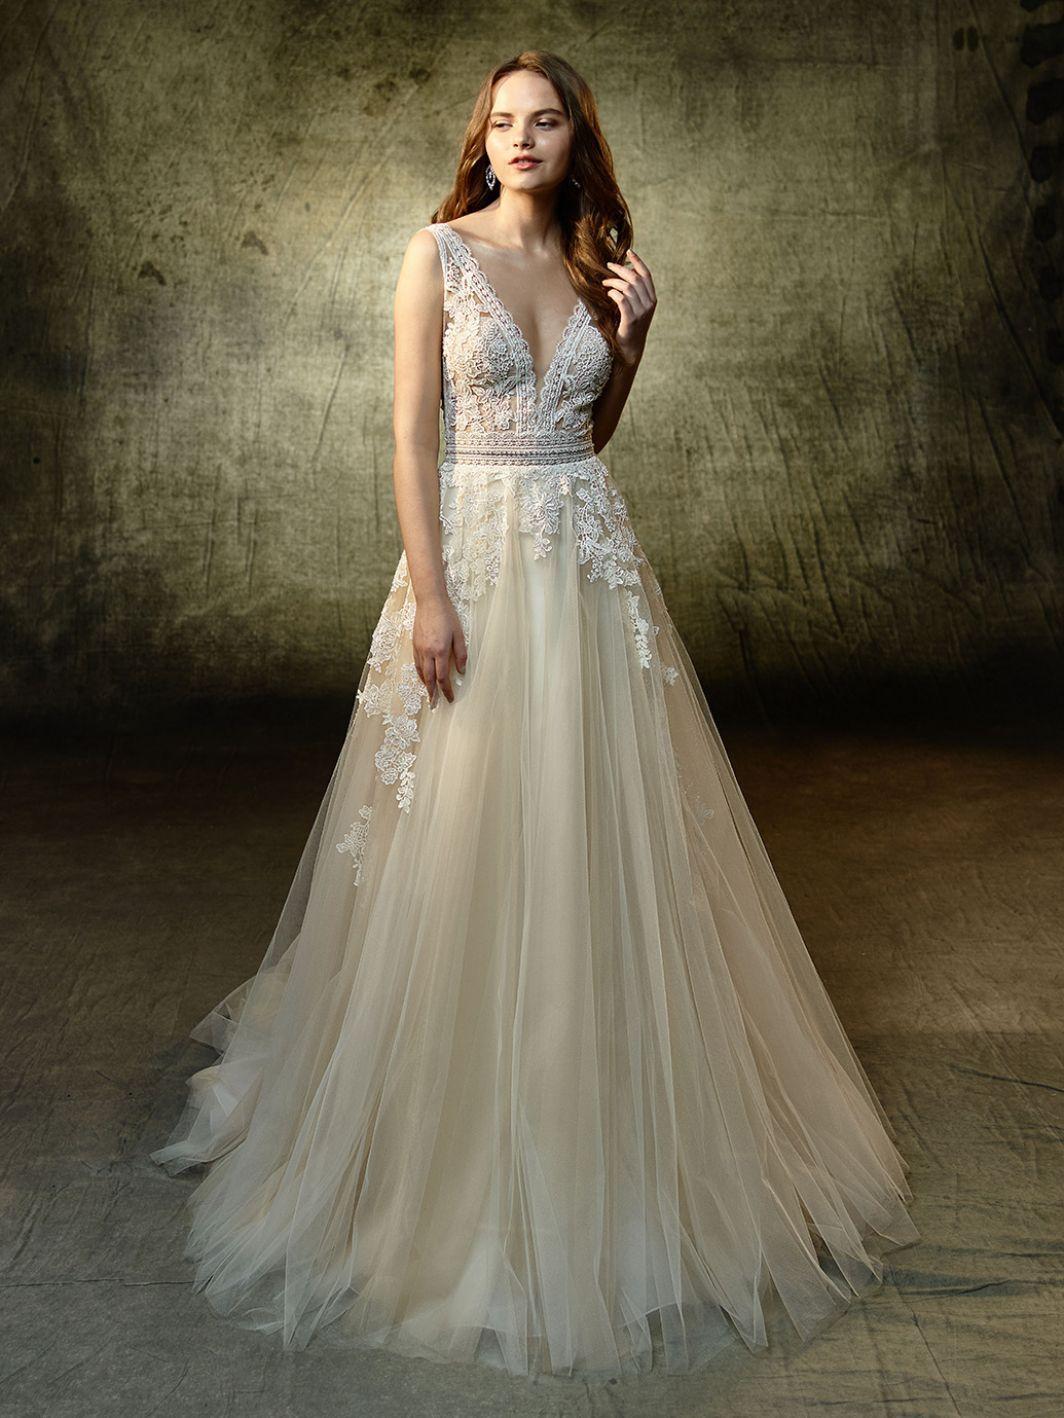 Lavender FrontCollection name   Wedding u Engagement